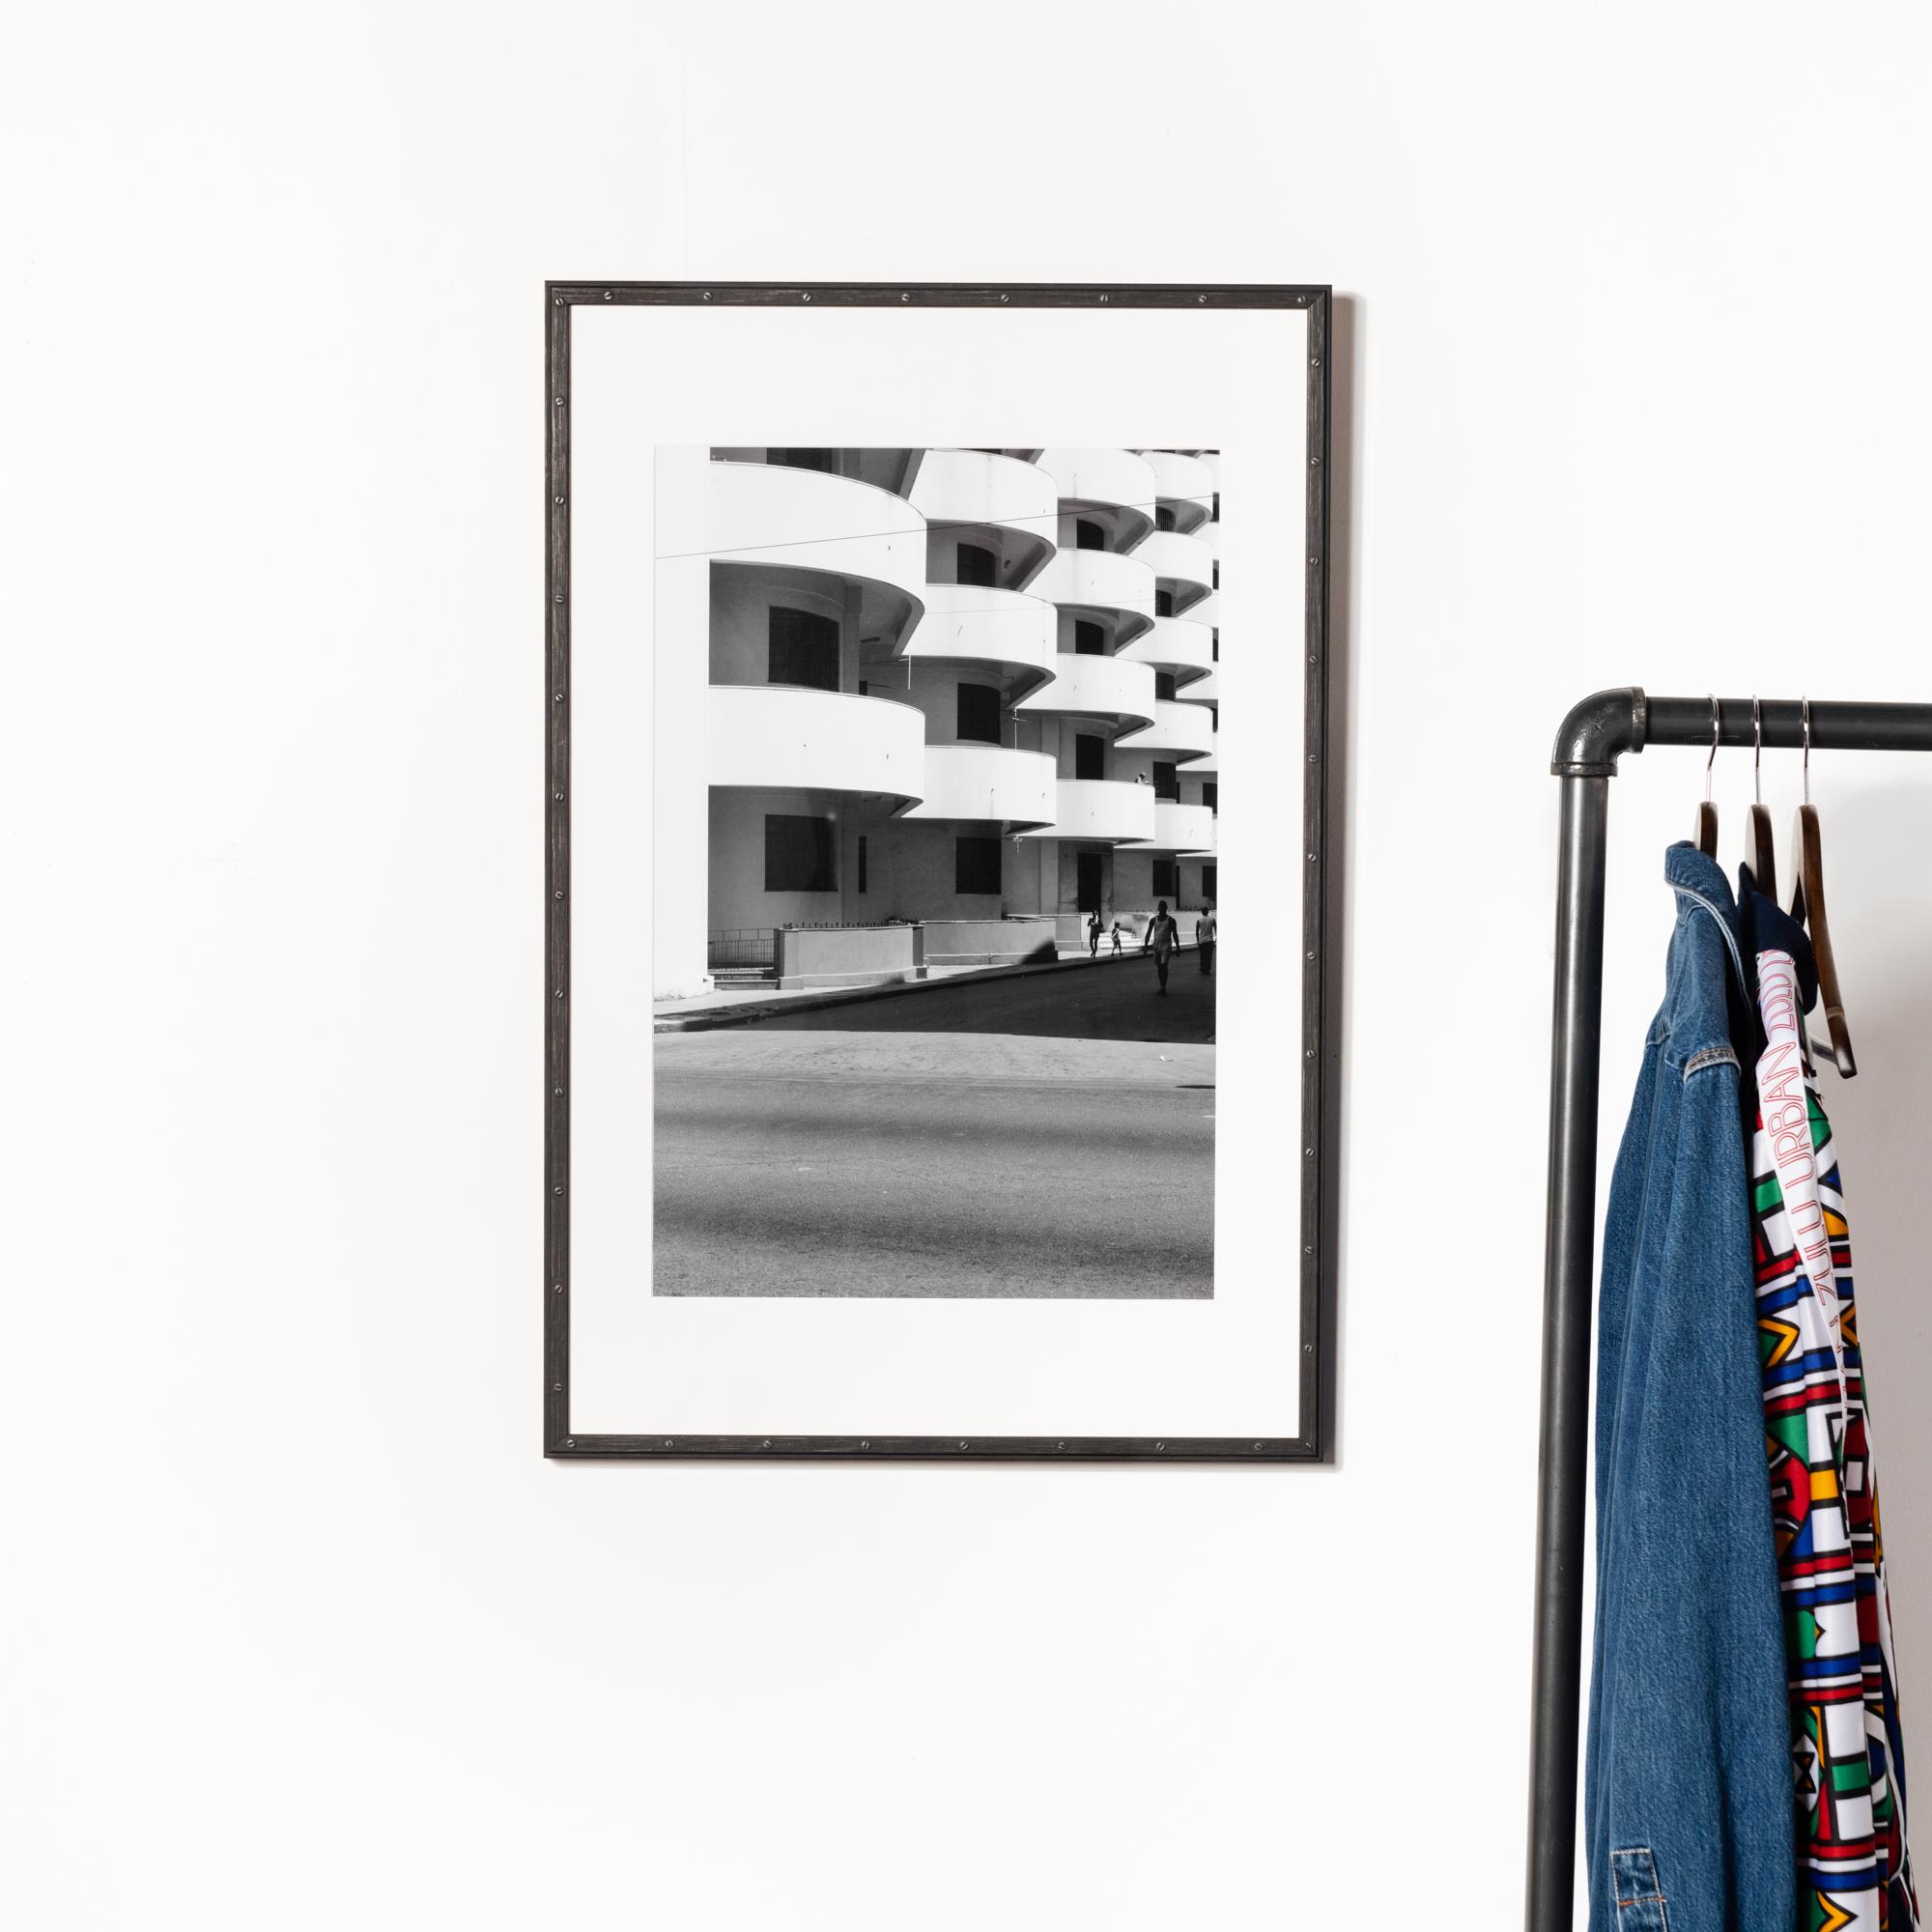 Framebridge Black Artists Print Shop Mhandy Gerard Scalloped Balconies framed print Bolton frame